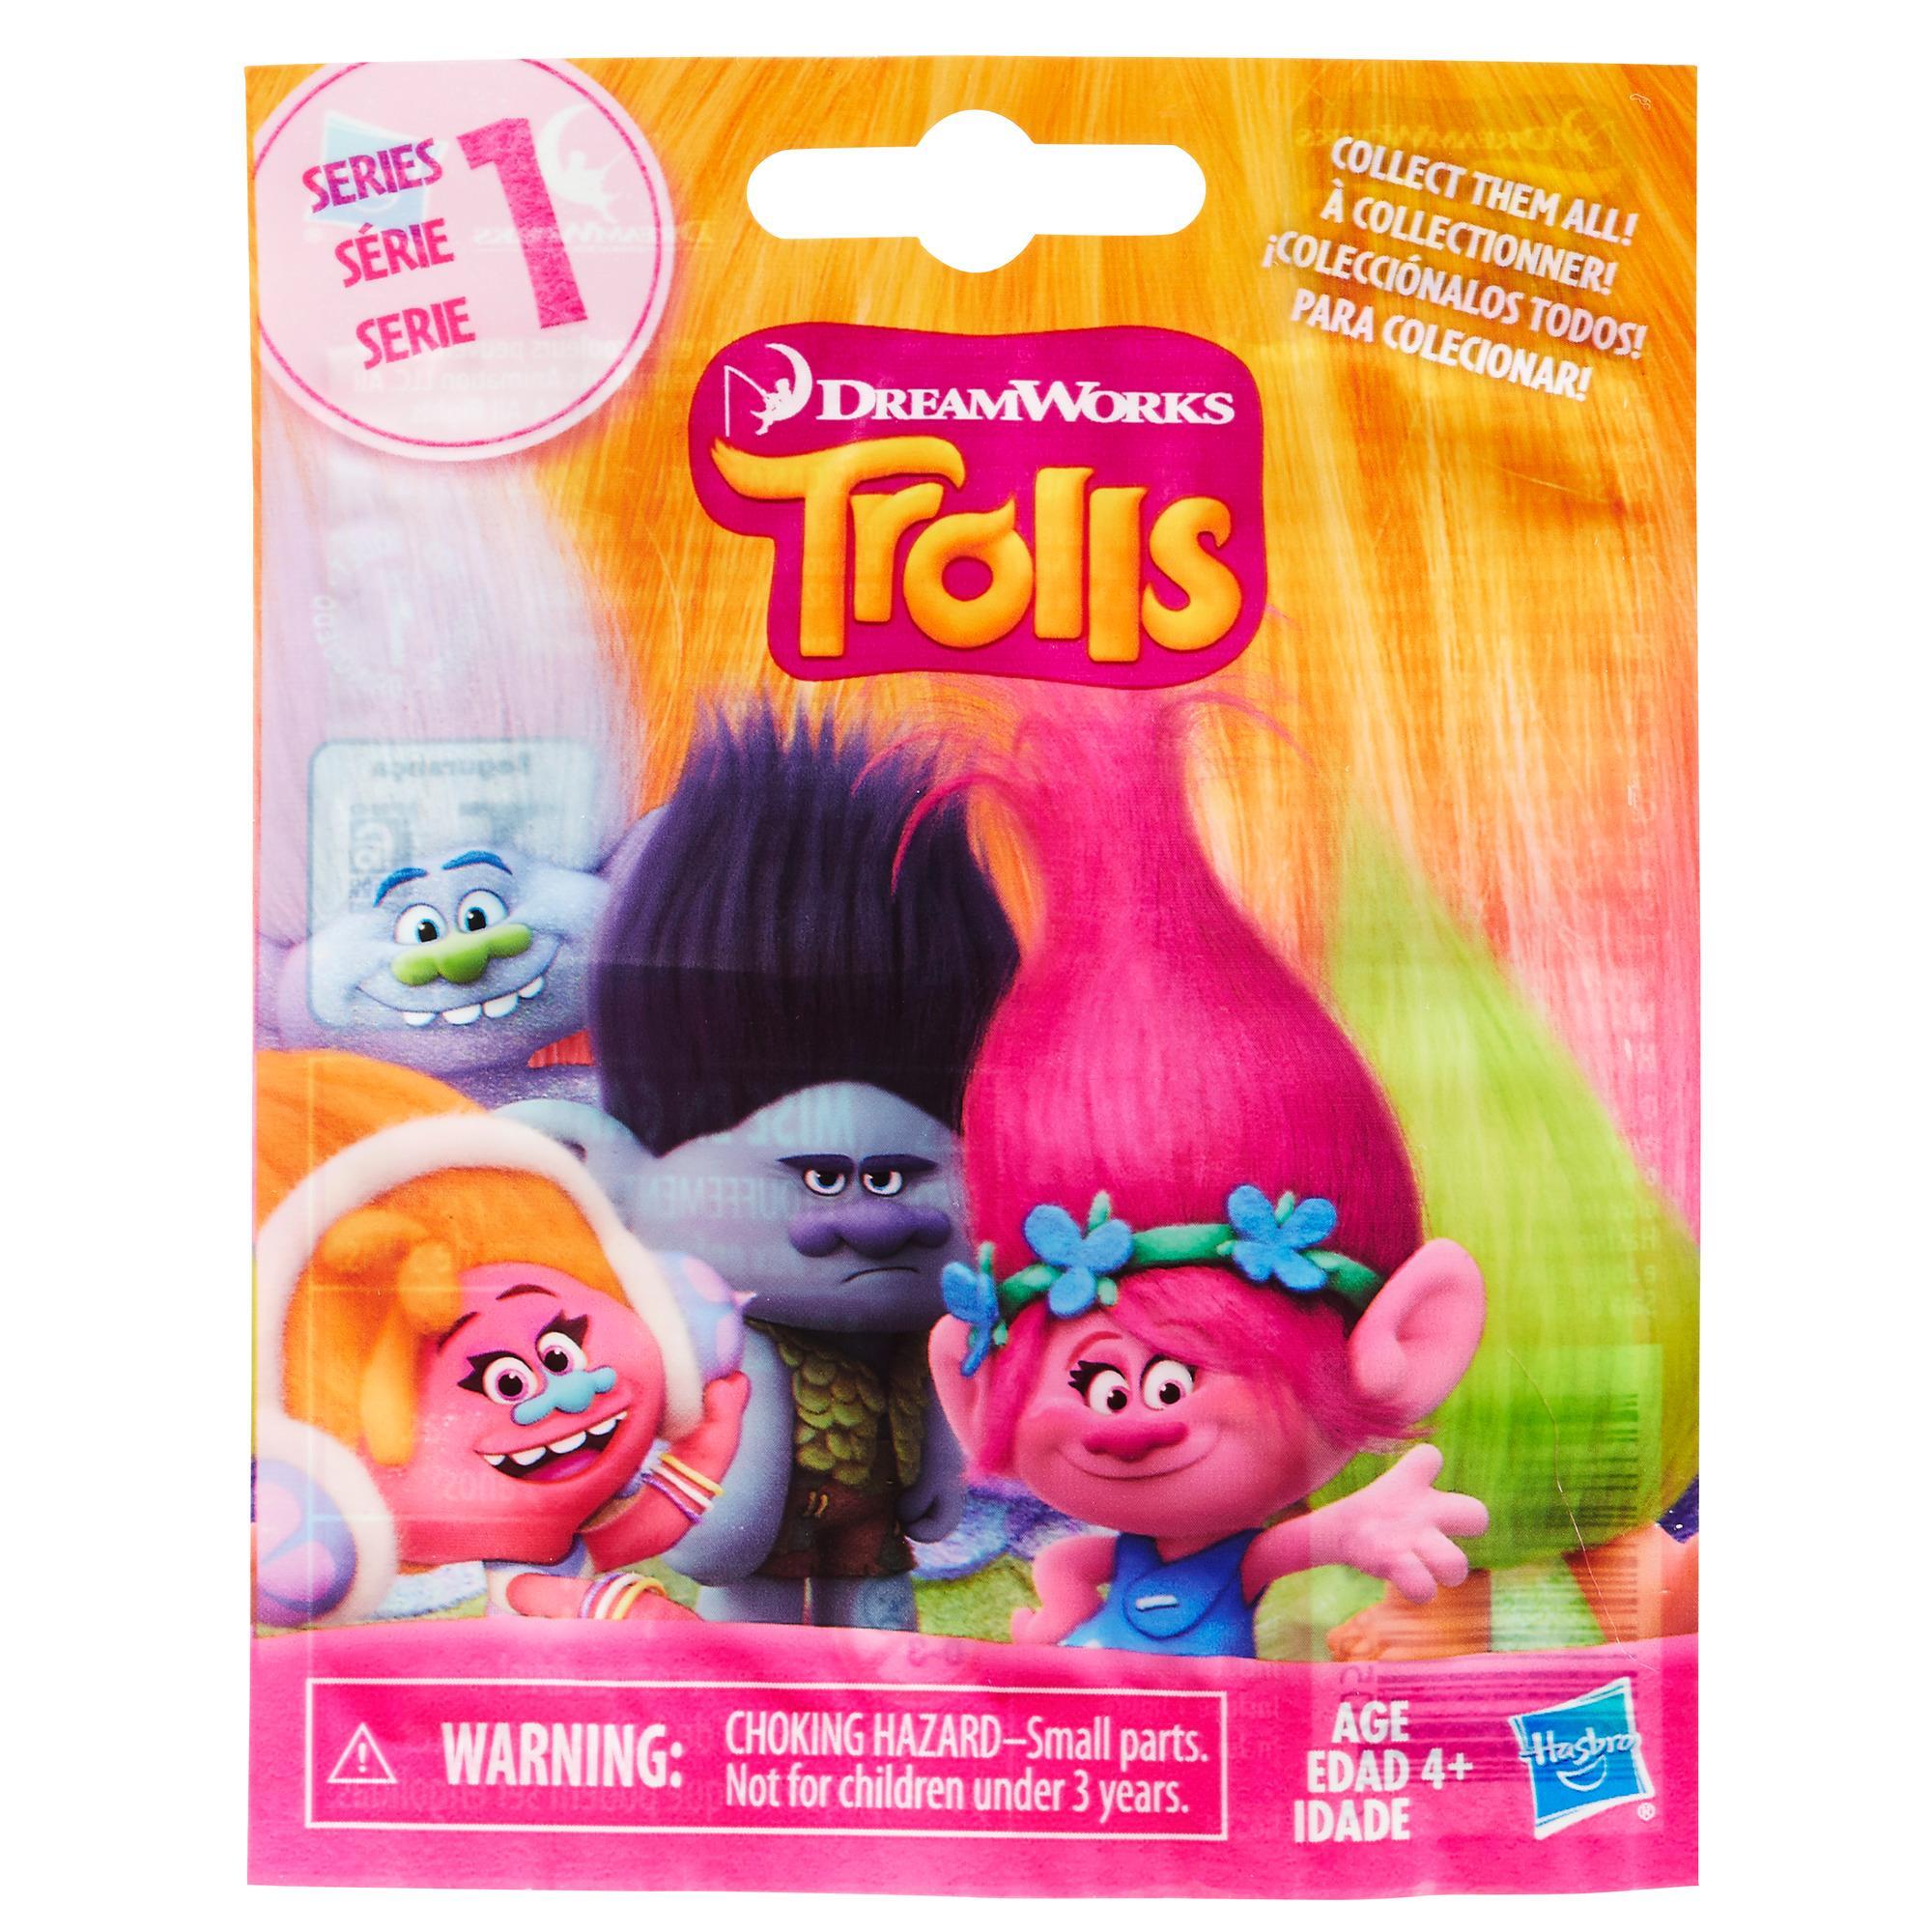 DreamWorks Trolls Surprise Mini Figure